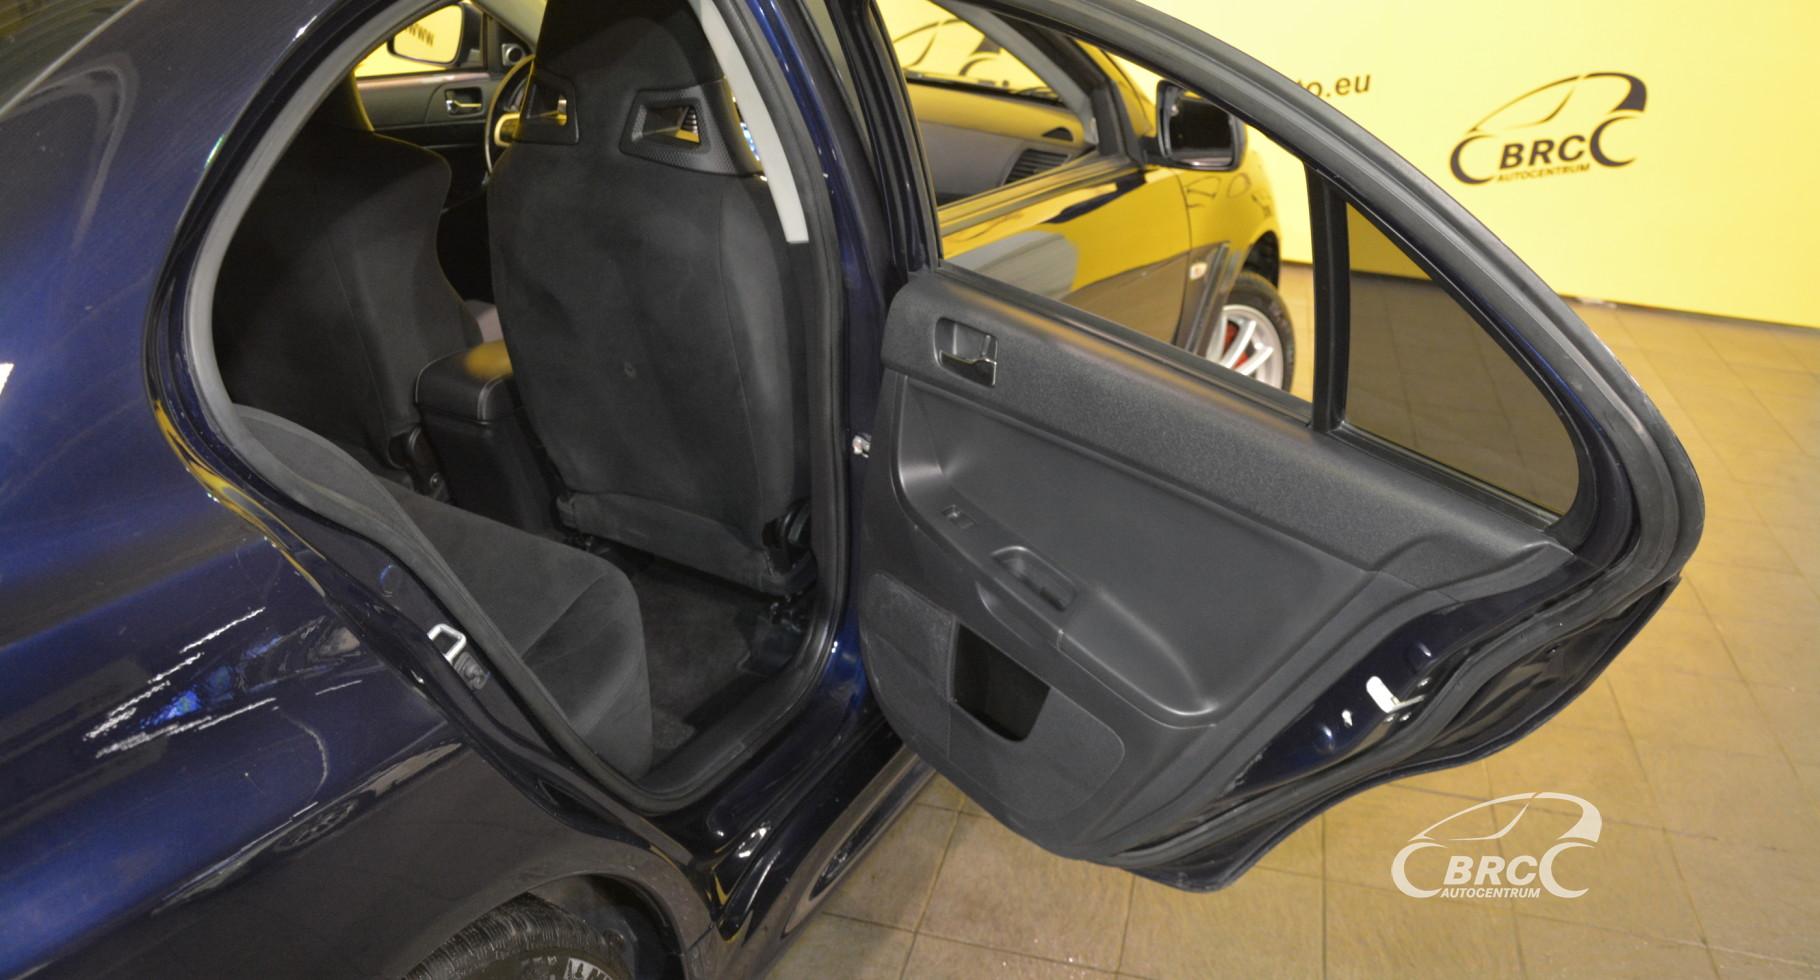 Mitsubishi Lancer Evolution X Turbo Mivec